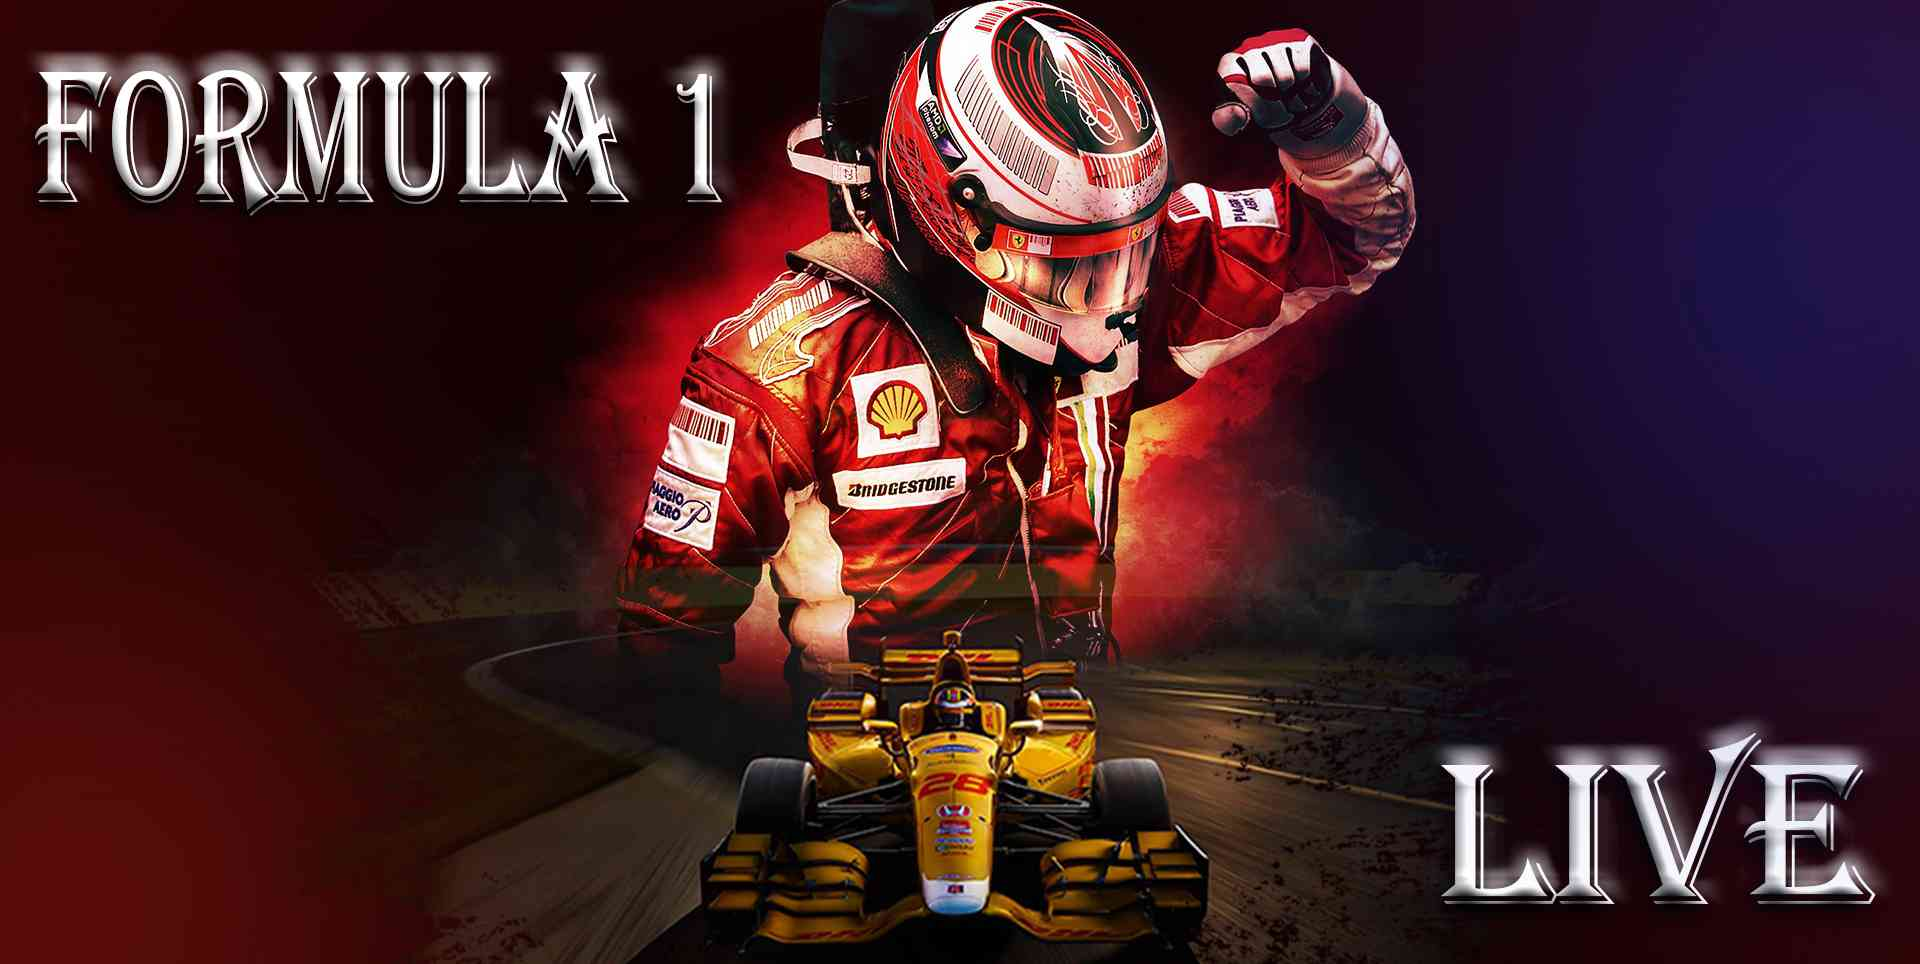 Yas Marina F1 Abu Dhabi Grand Prix